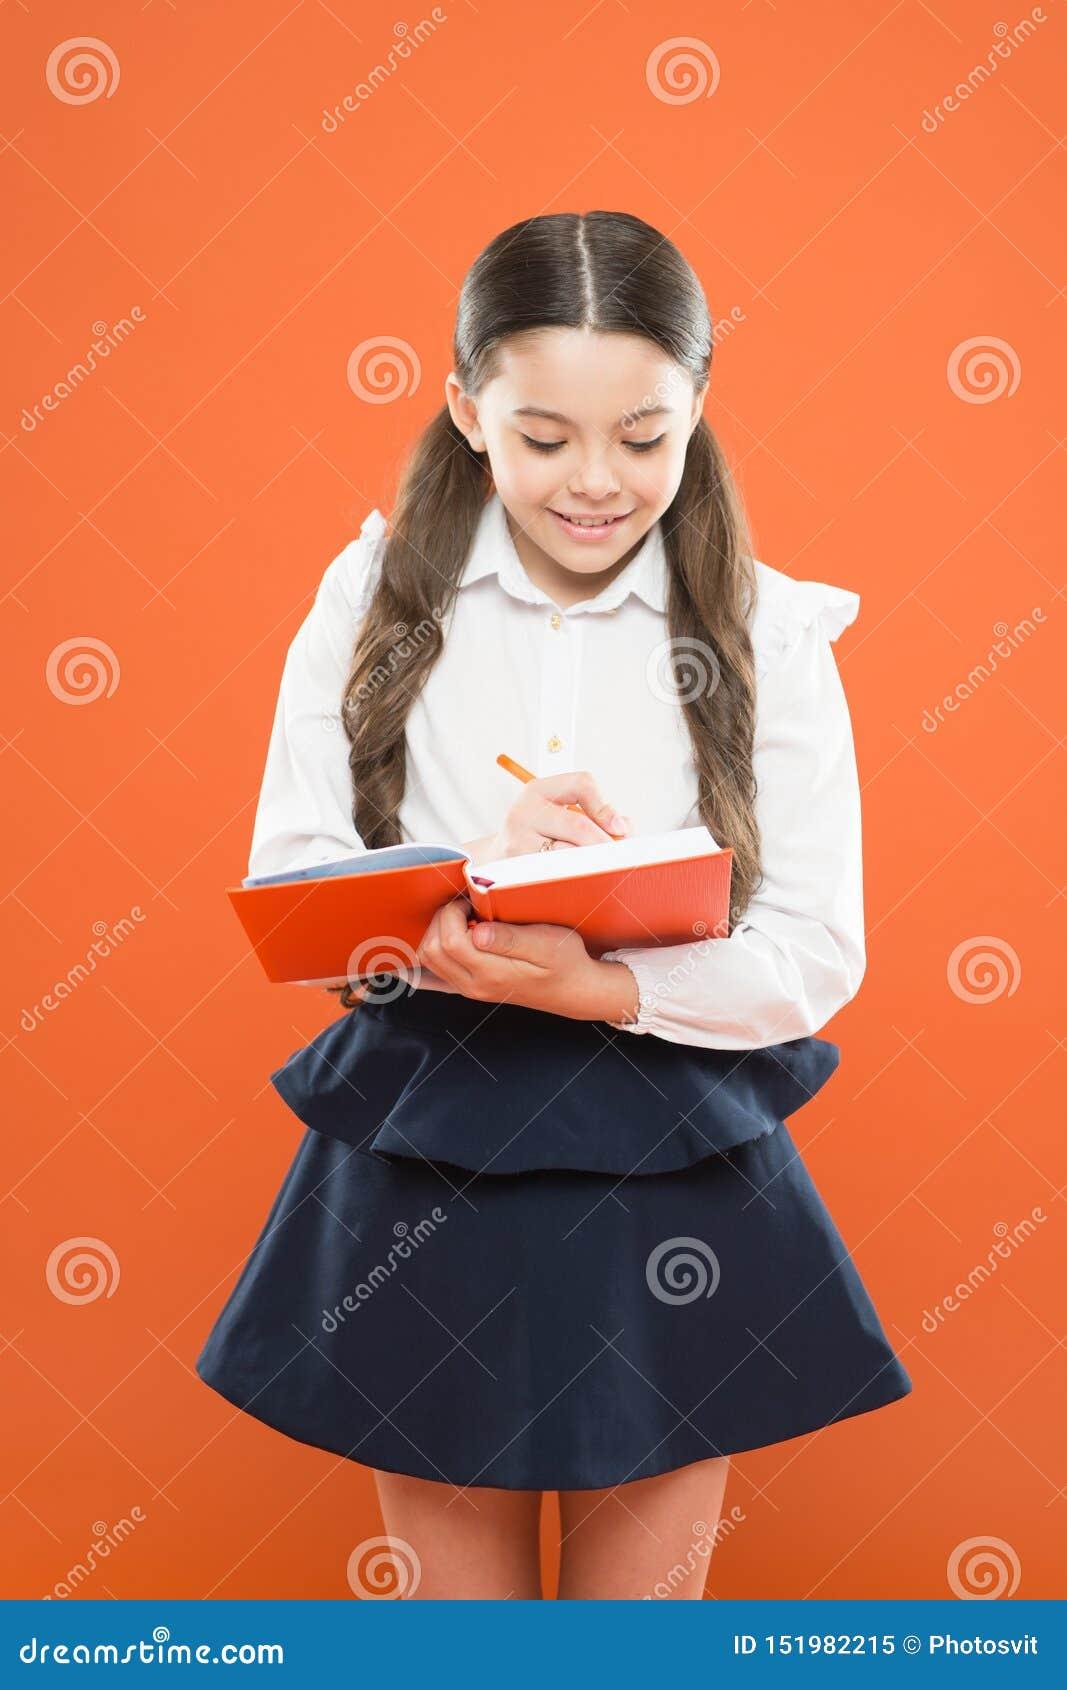 School uniform research